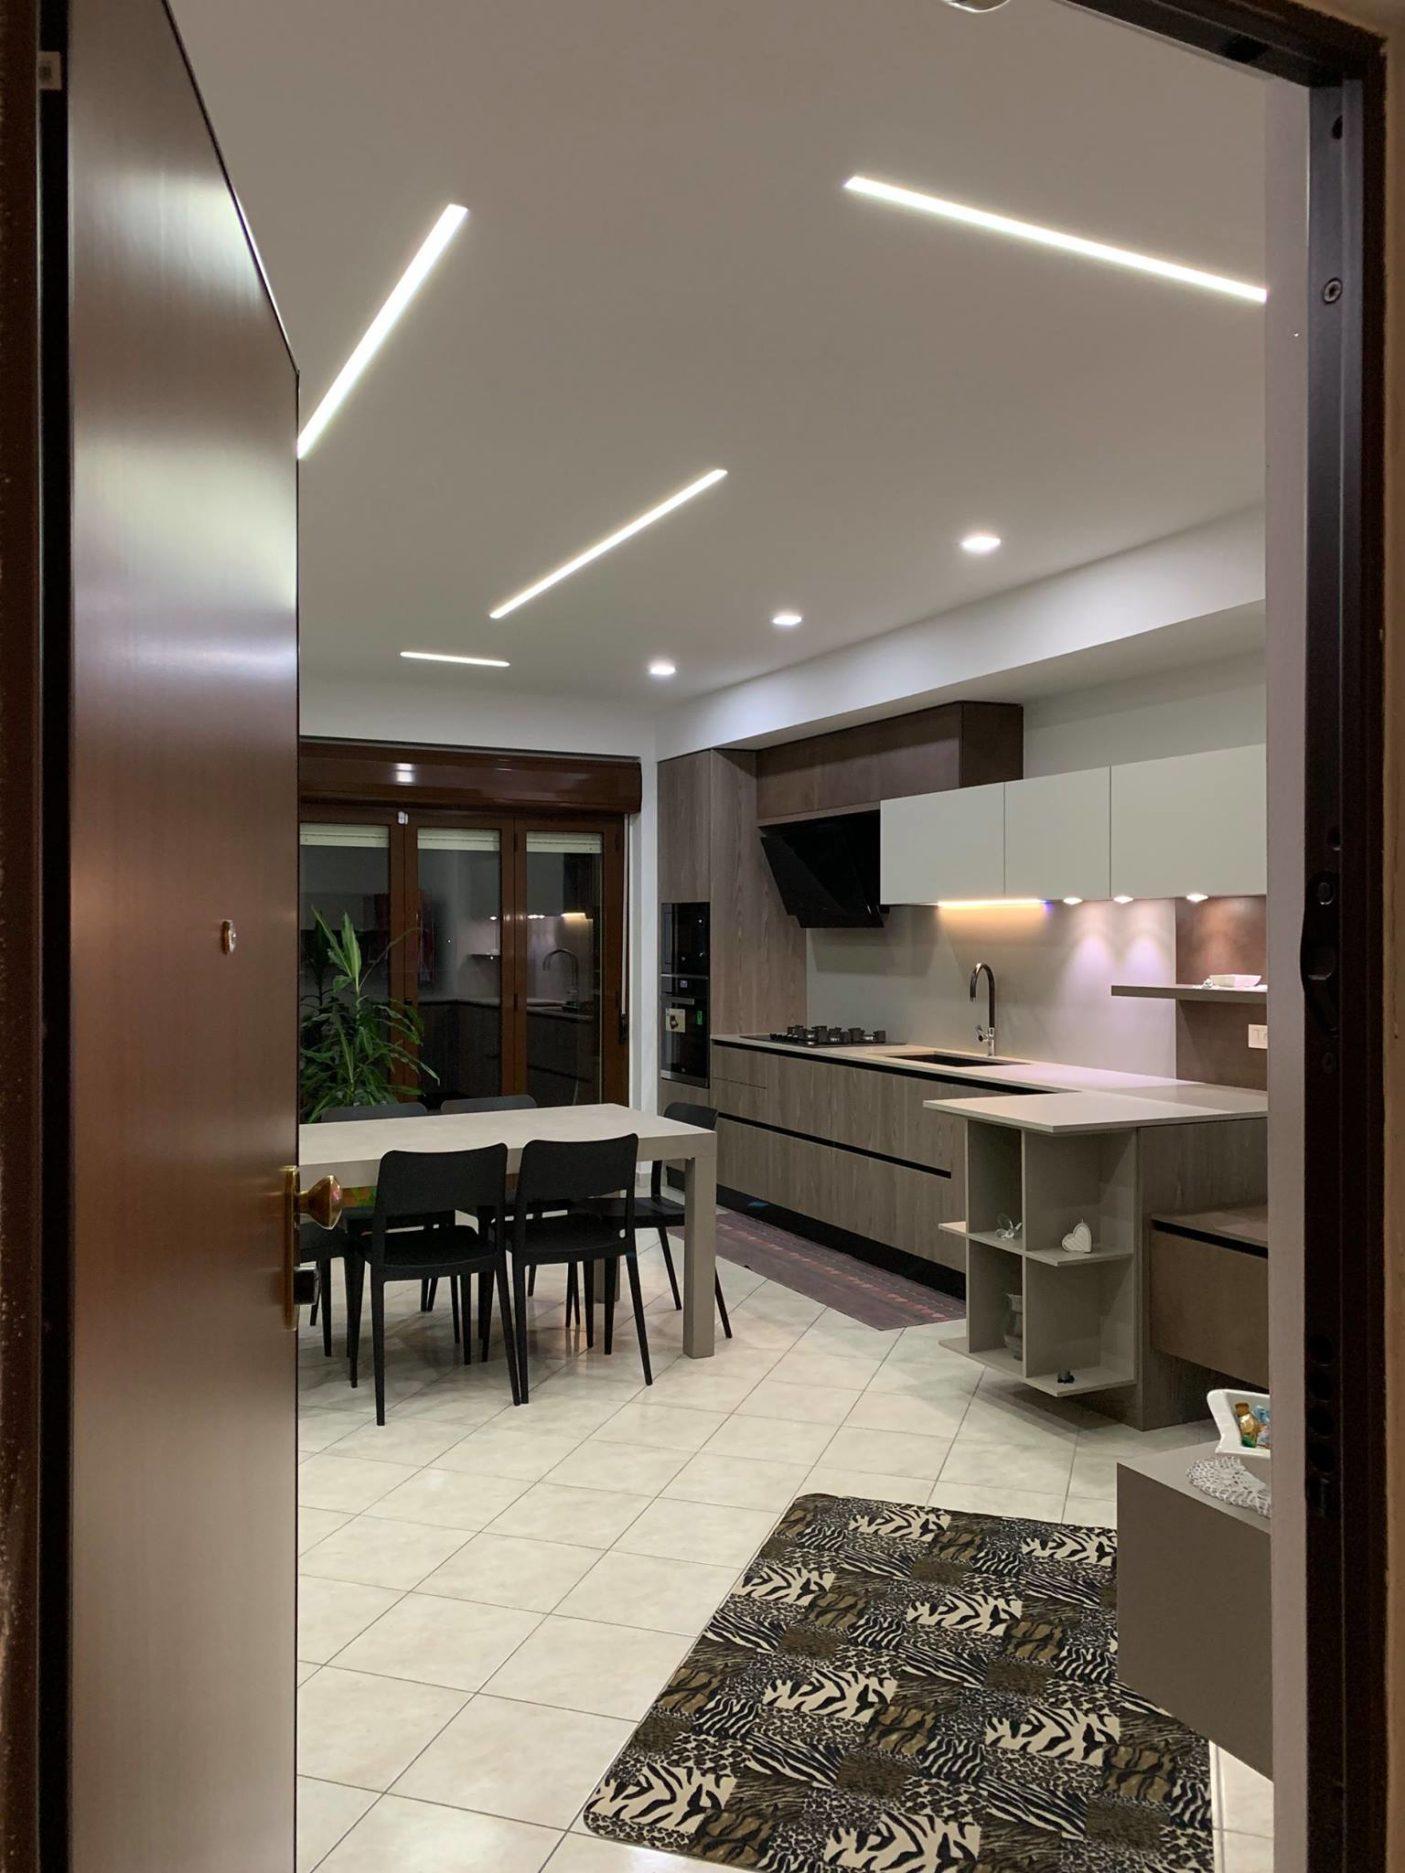 Cucina-Creo-Kitchens-Tablet-Stile-moderno7.jpg